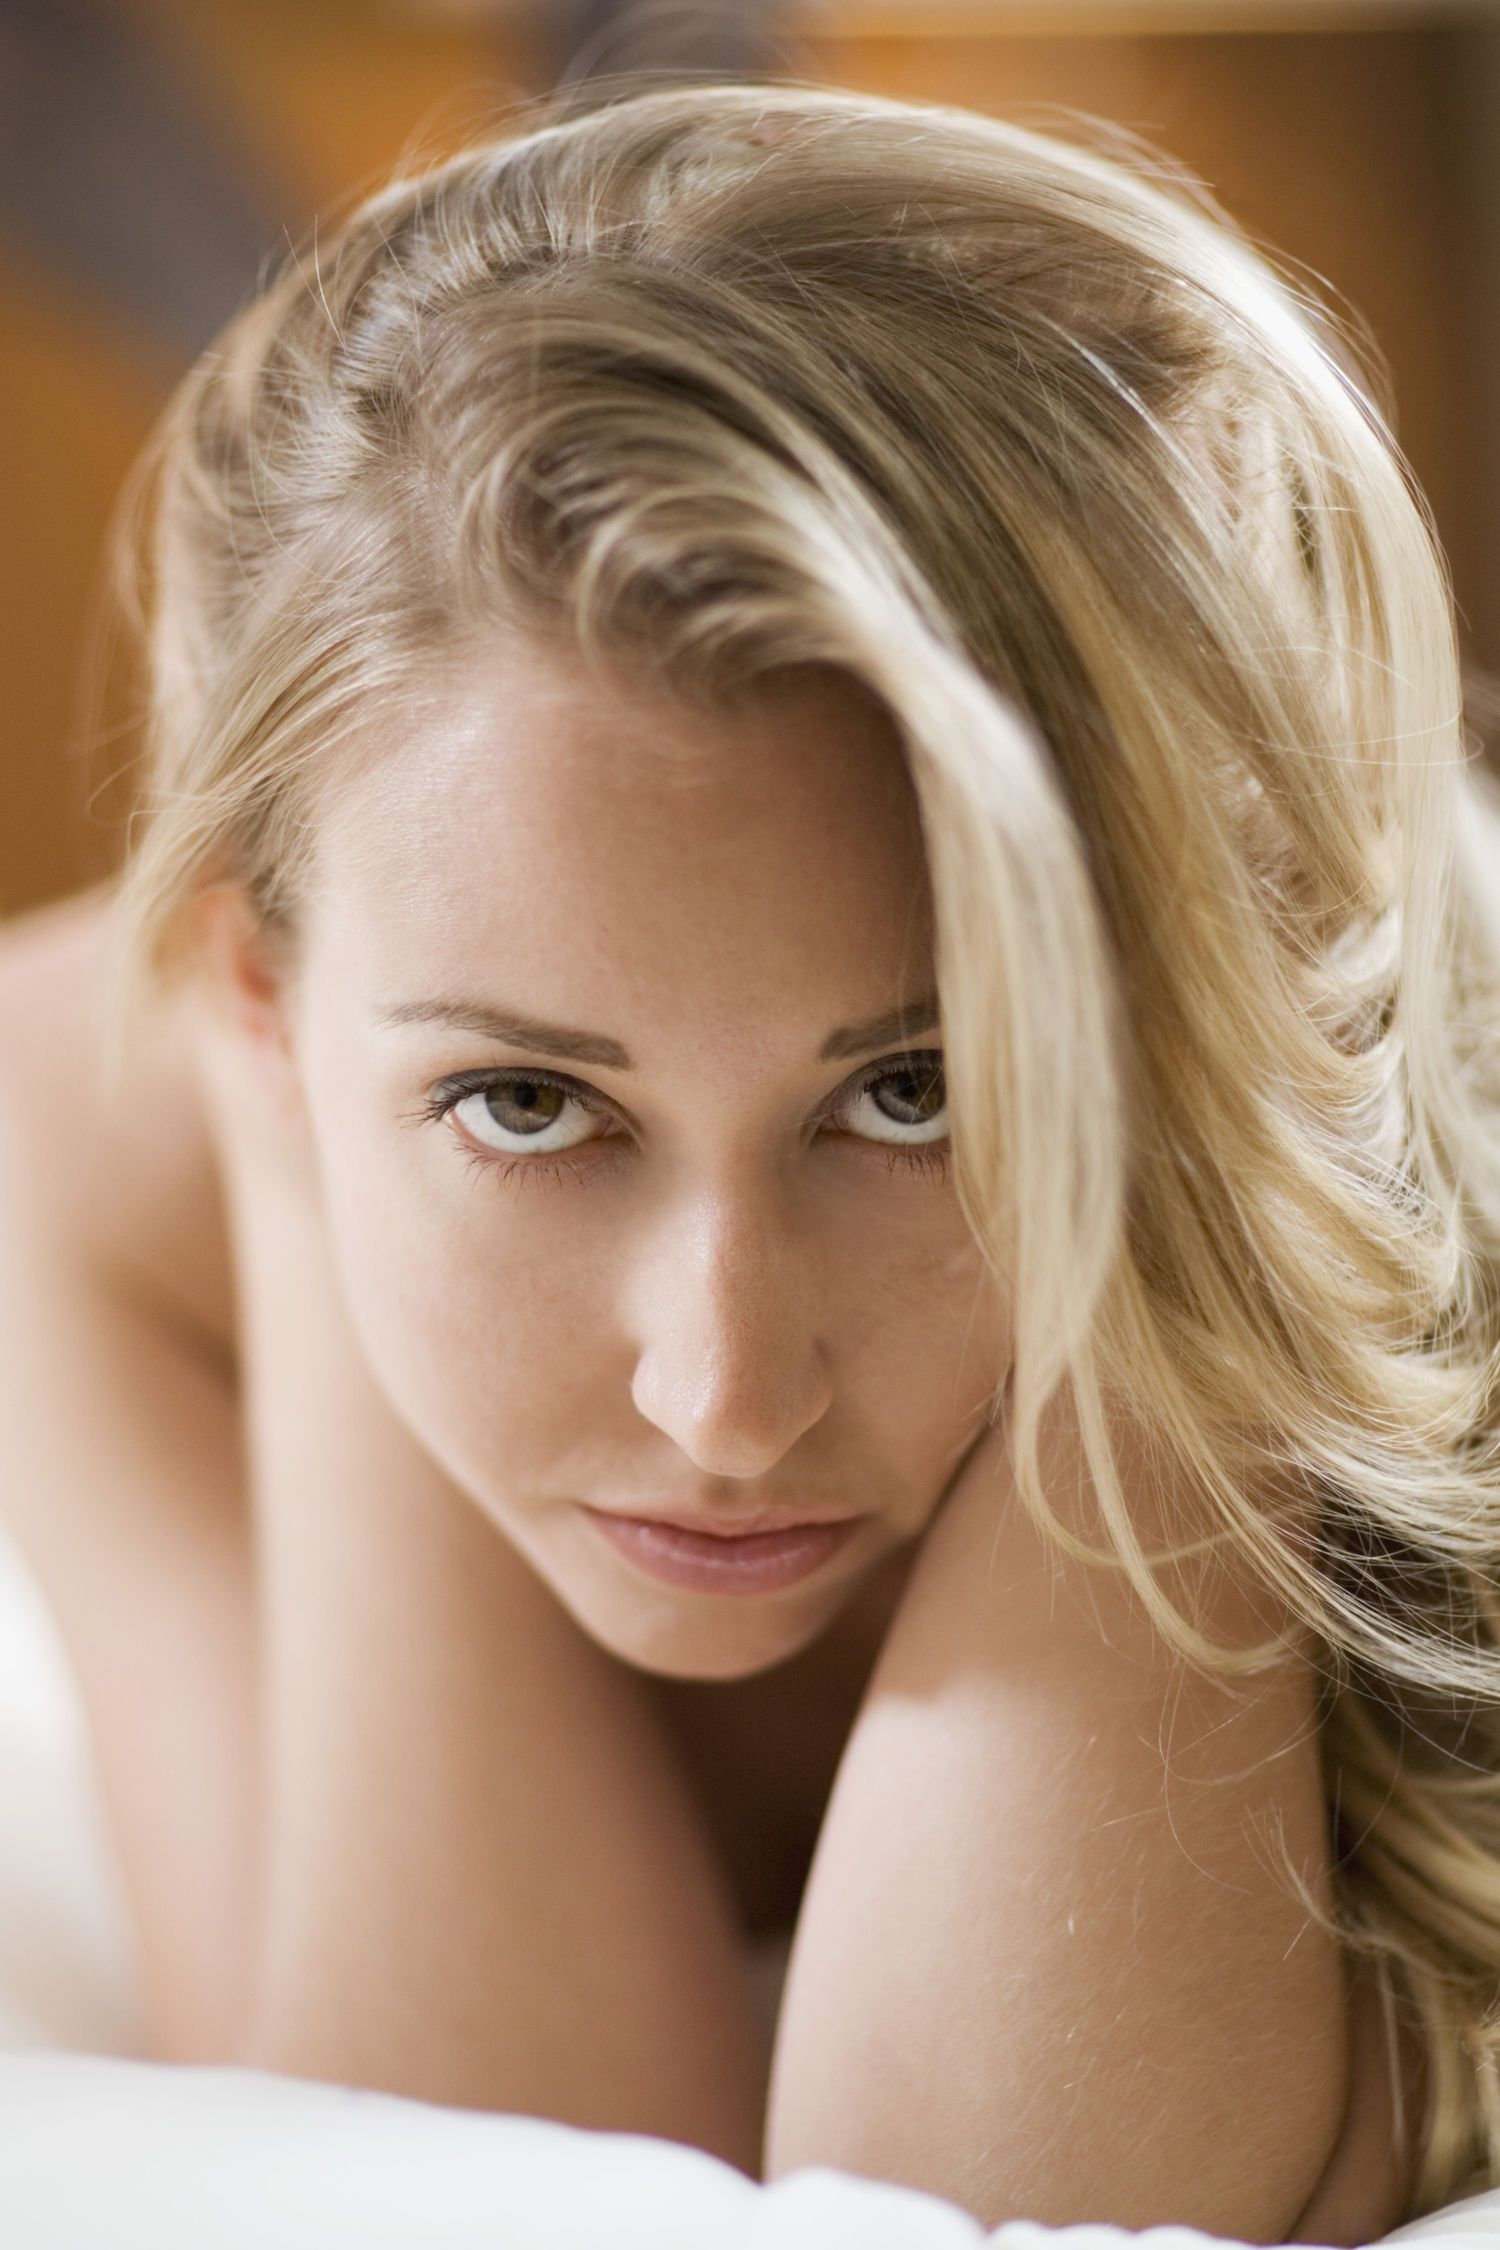 Nice girl nude